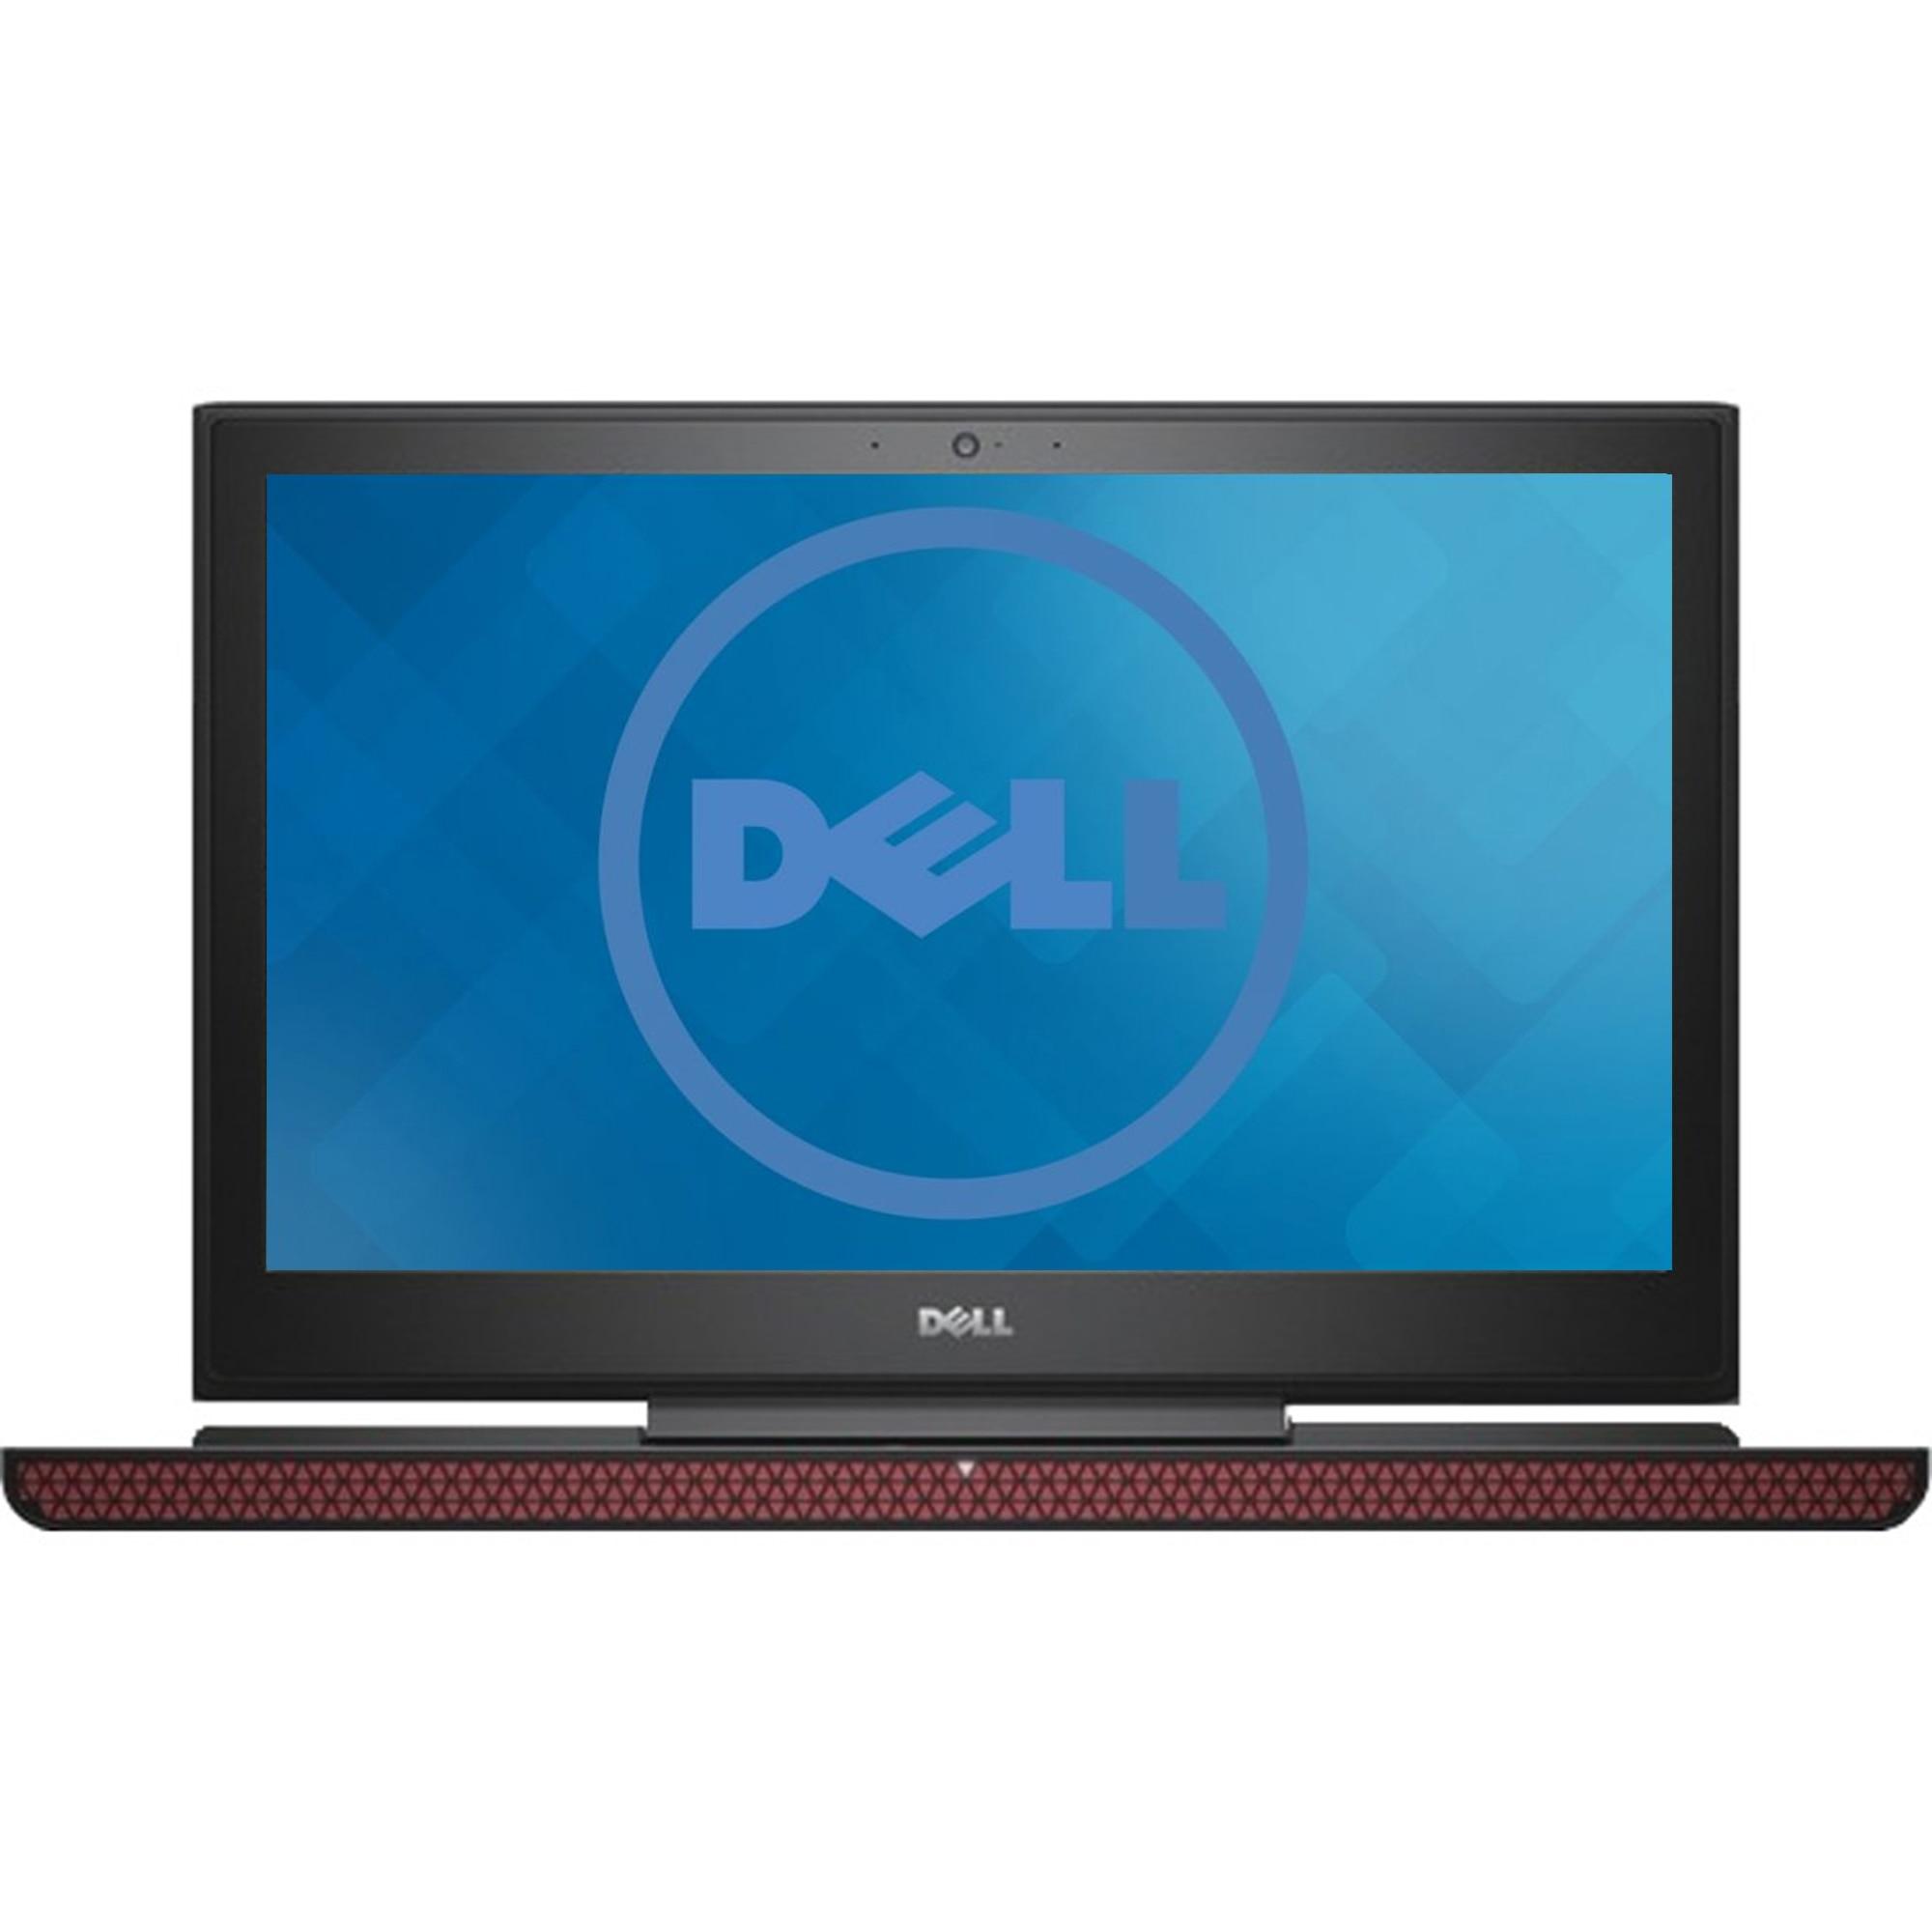 "Fotografie Laptop Gaming Dell Inspiron 7567 cu procesor Intel® Core™ i5-7300HQ 2.50 GHz, Kaby Lake™, 15.6"", Full HD, 8GB, 1TB + 8GB, nVIDIA GeForce 1050 4GB, Ubuntu Linux, Black"